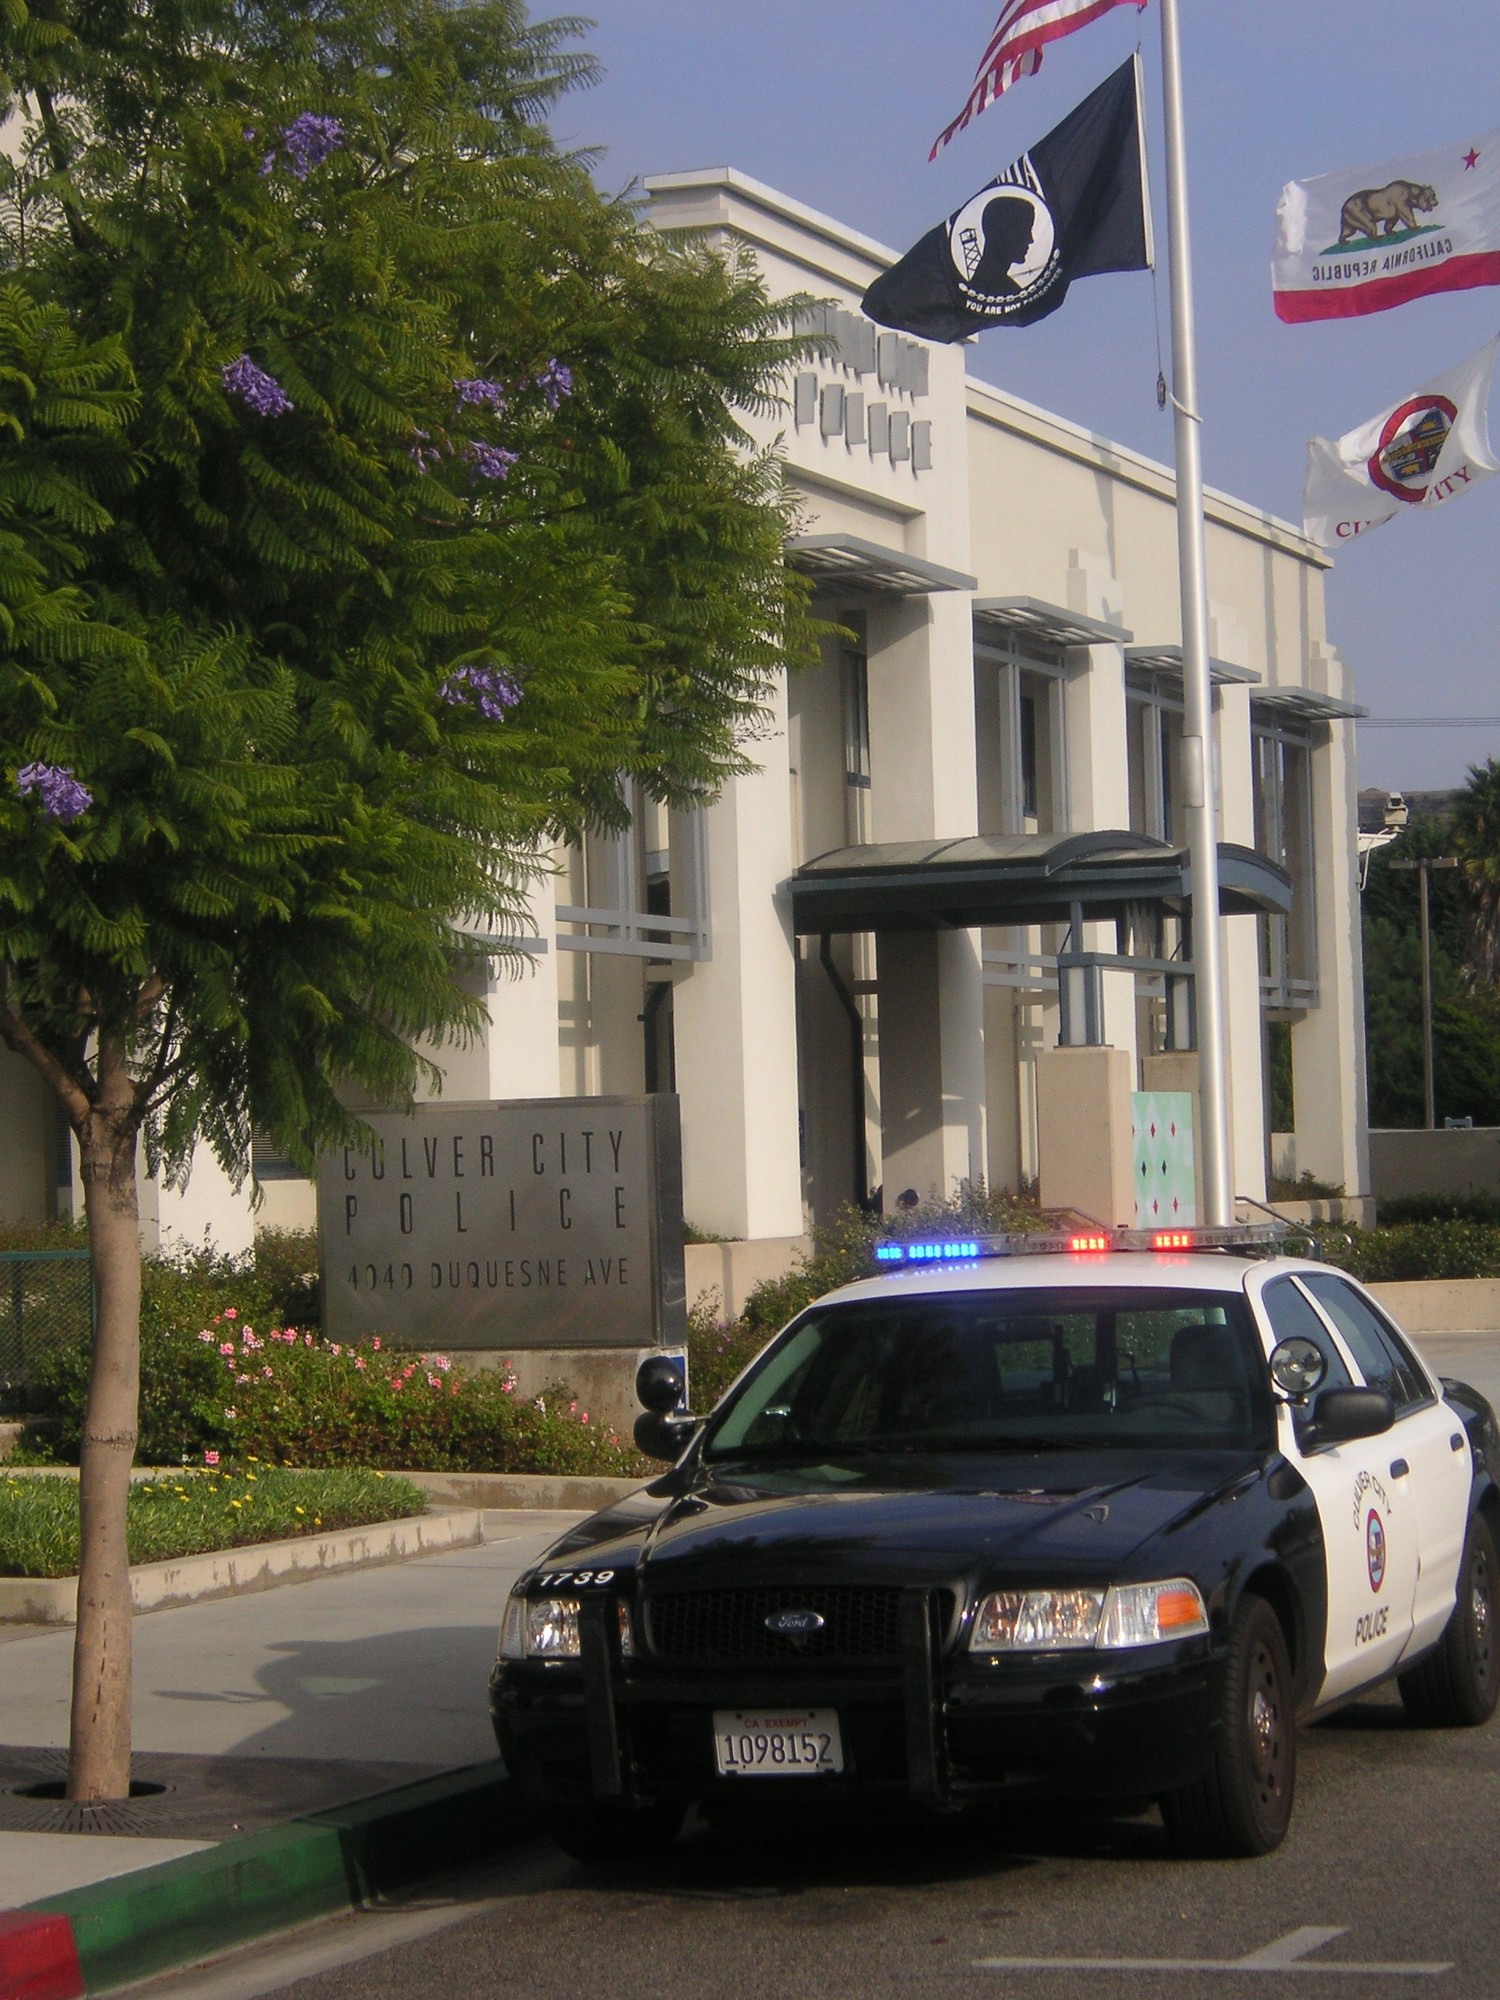 Culver City Police Department